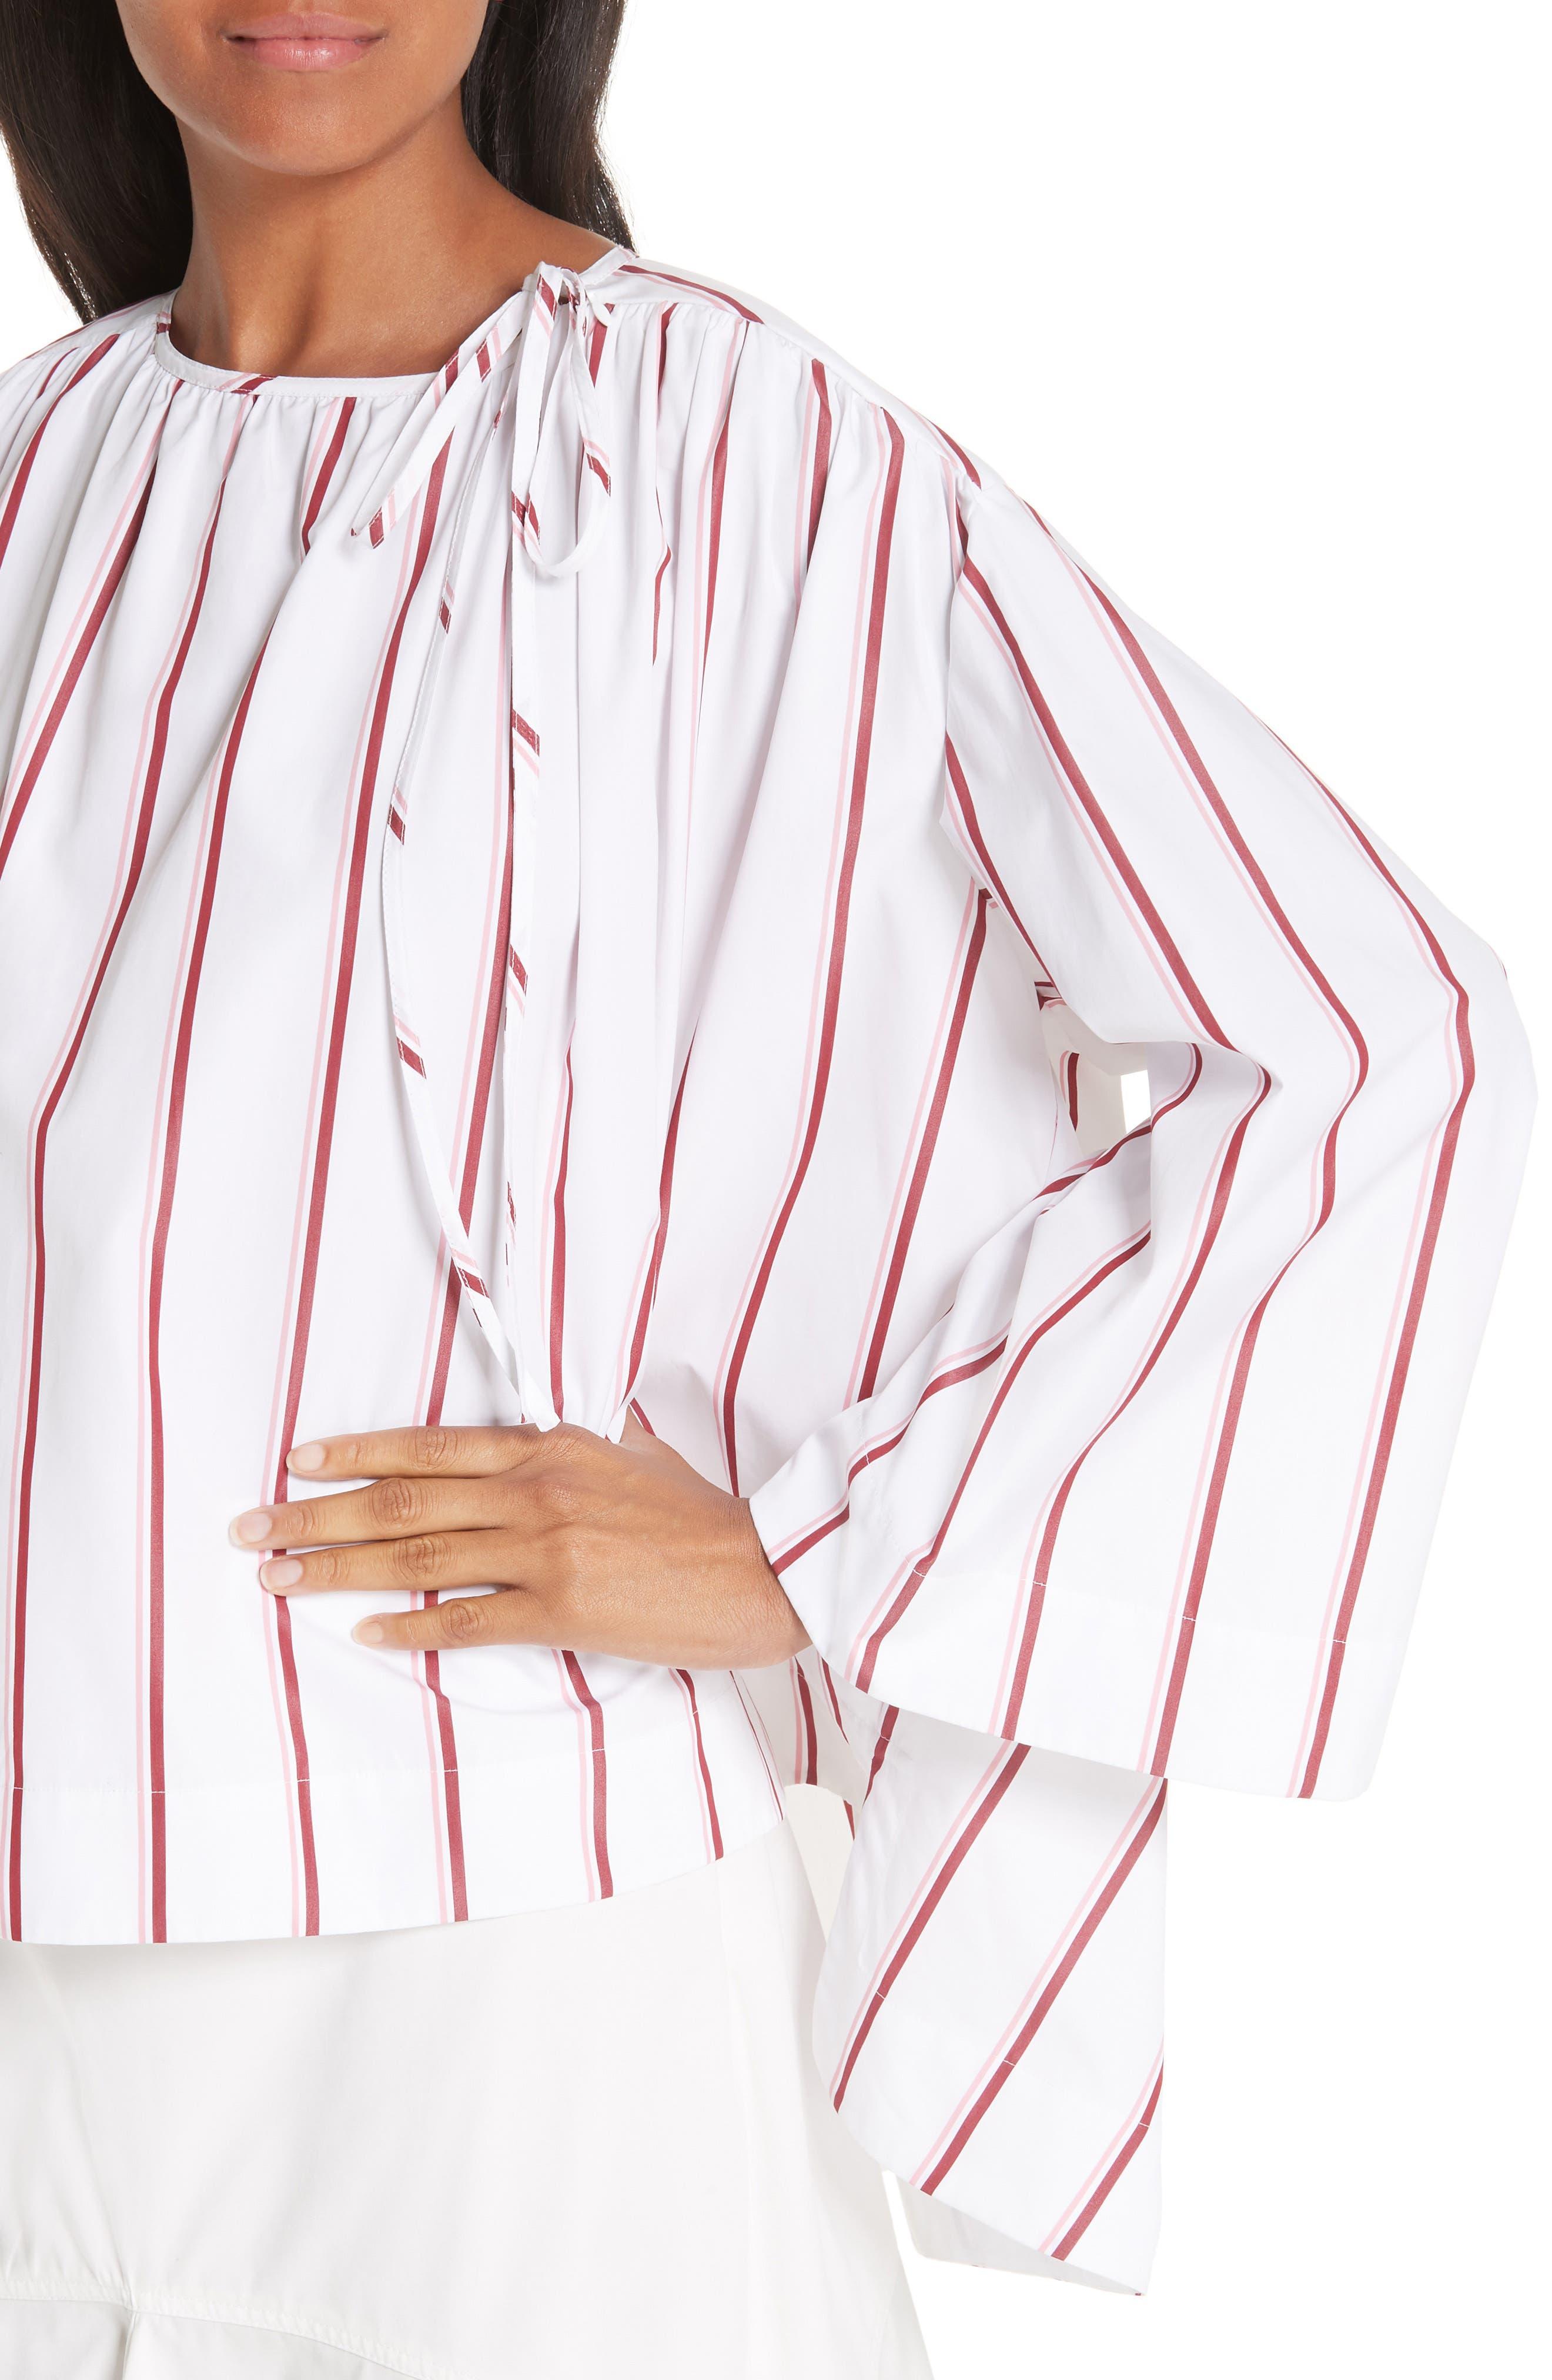 Tie Neck Cotton Poplin Blouse,                             Alternate thumbnail 4, color,                             OPTIC WHITE CAMEO PINK